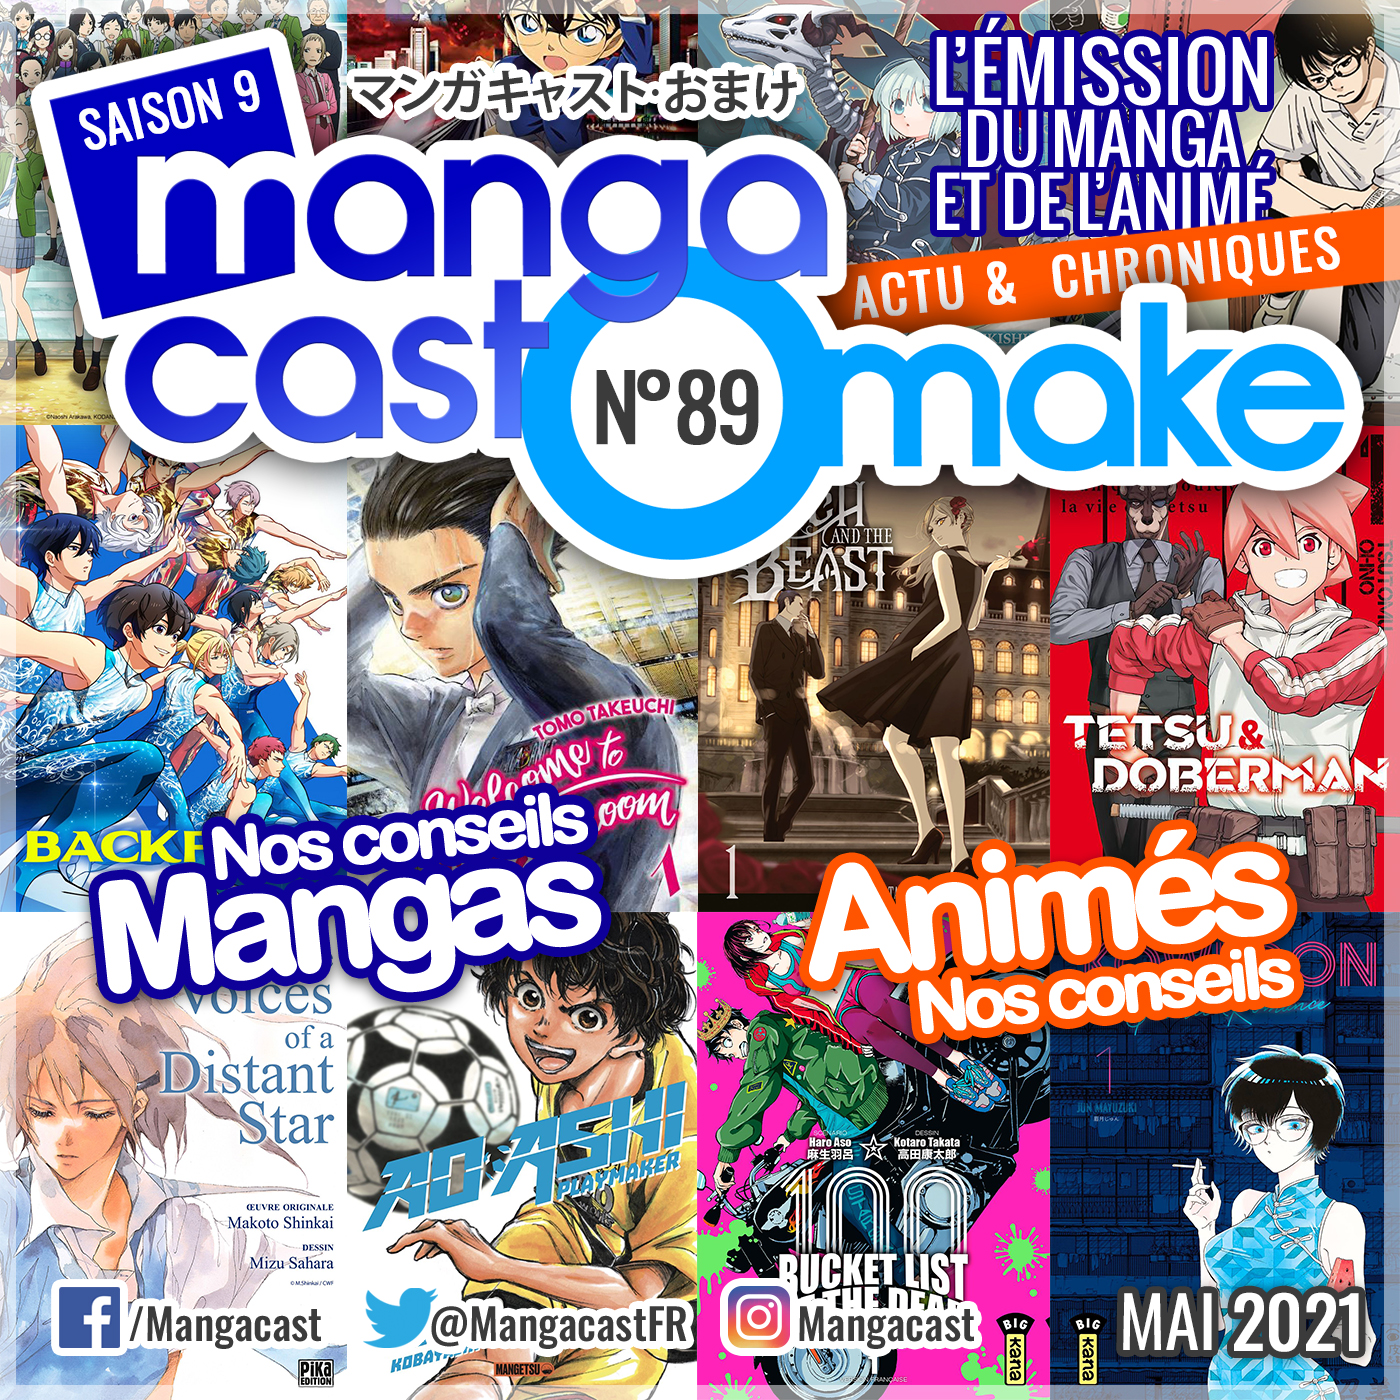 Cartouche du Mangacast Omake n°89